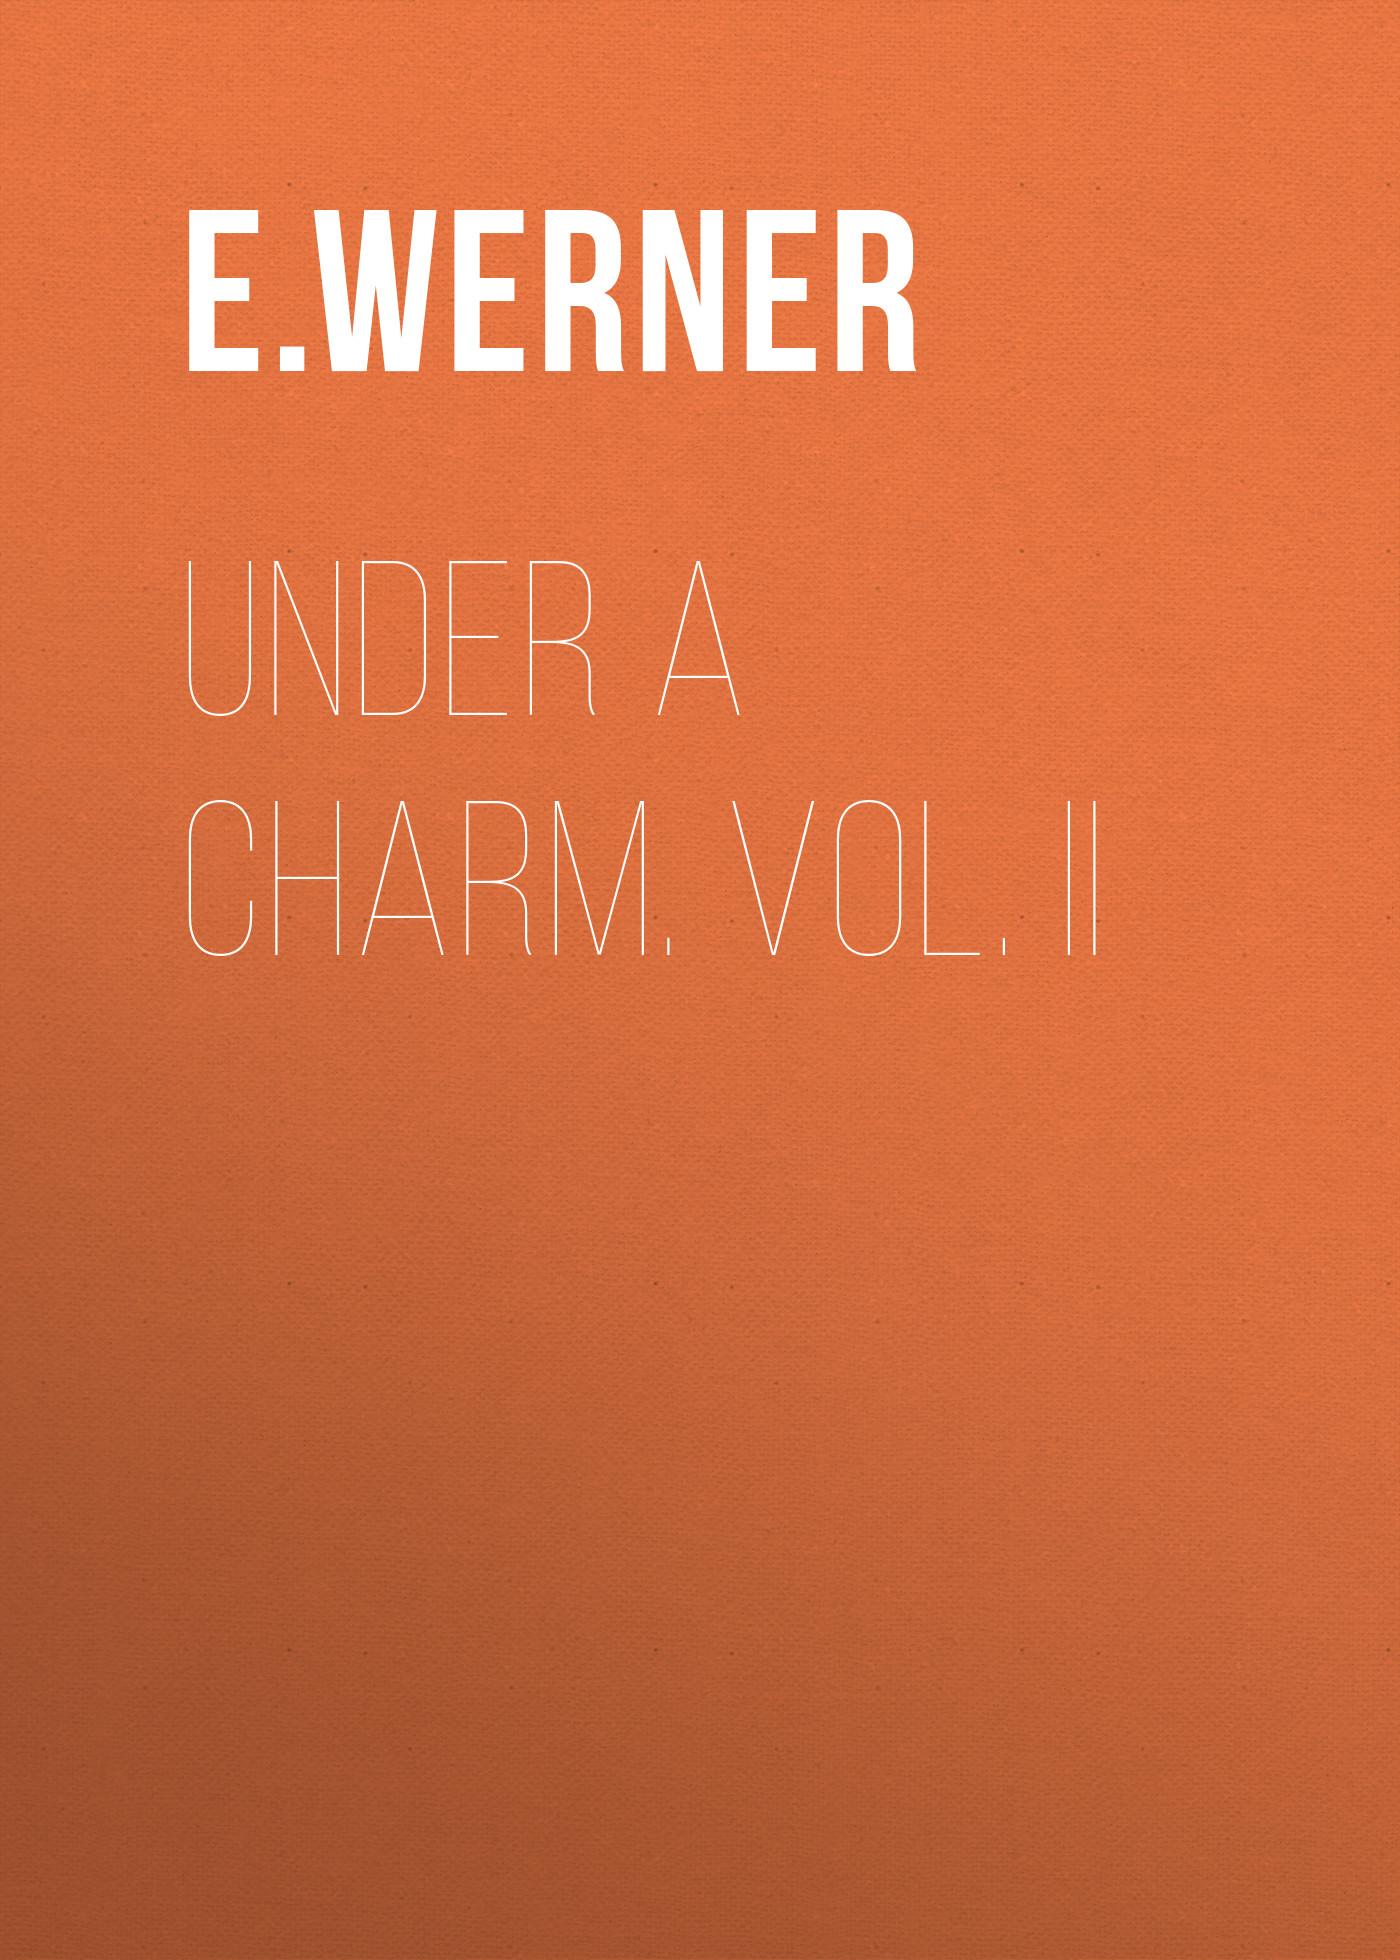 E. Werner Under a Charm. Vol. II e werner under a charm vol i